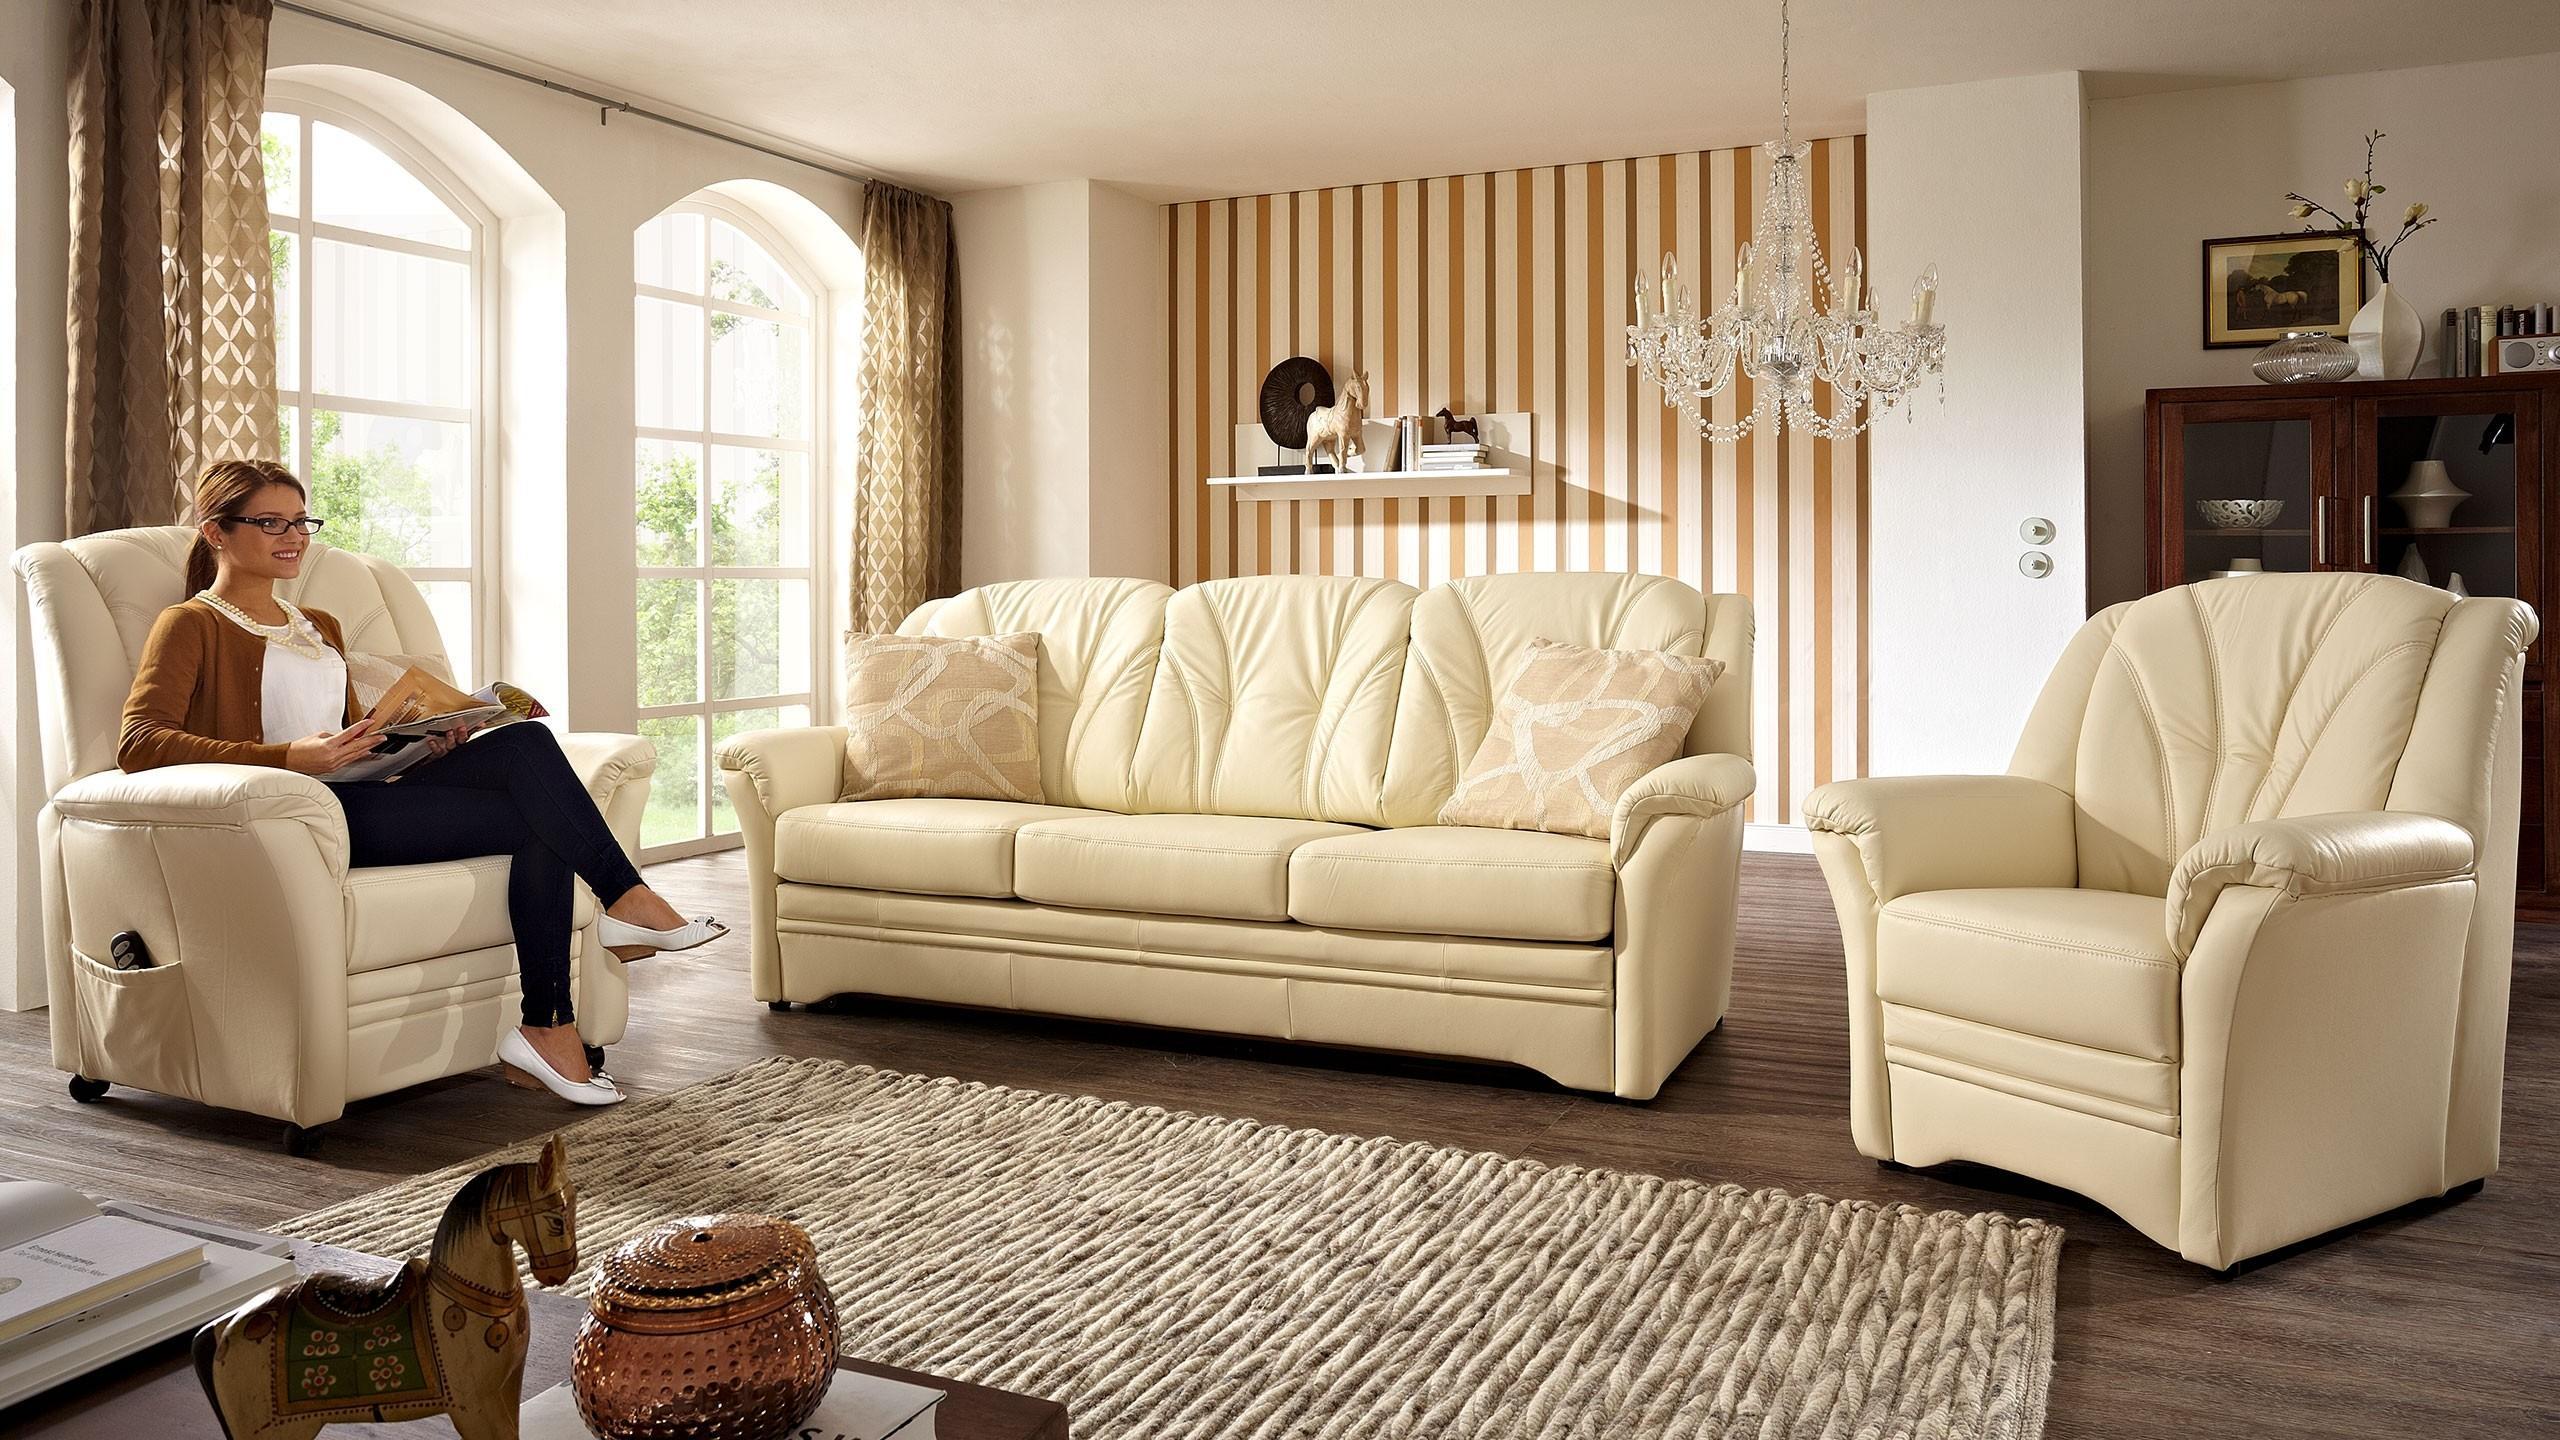 Berlin Sofa Leder Beige